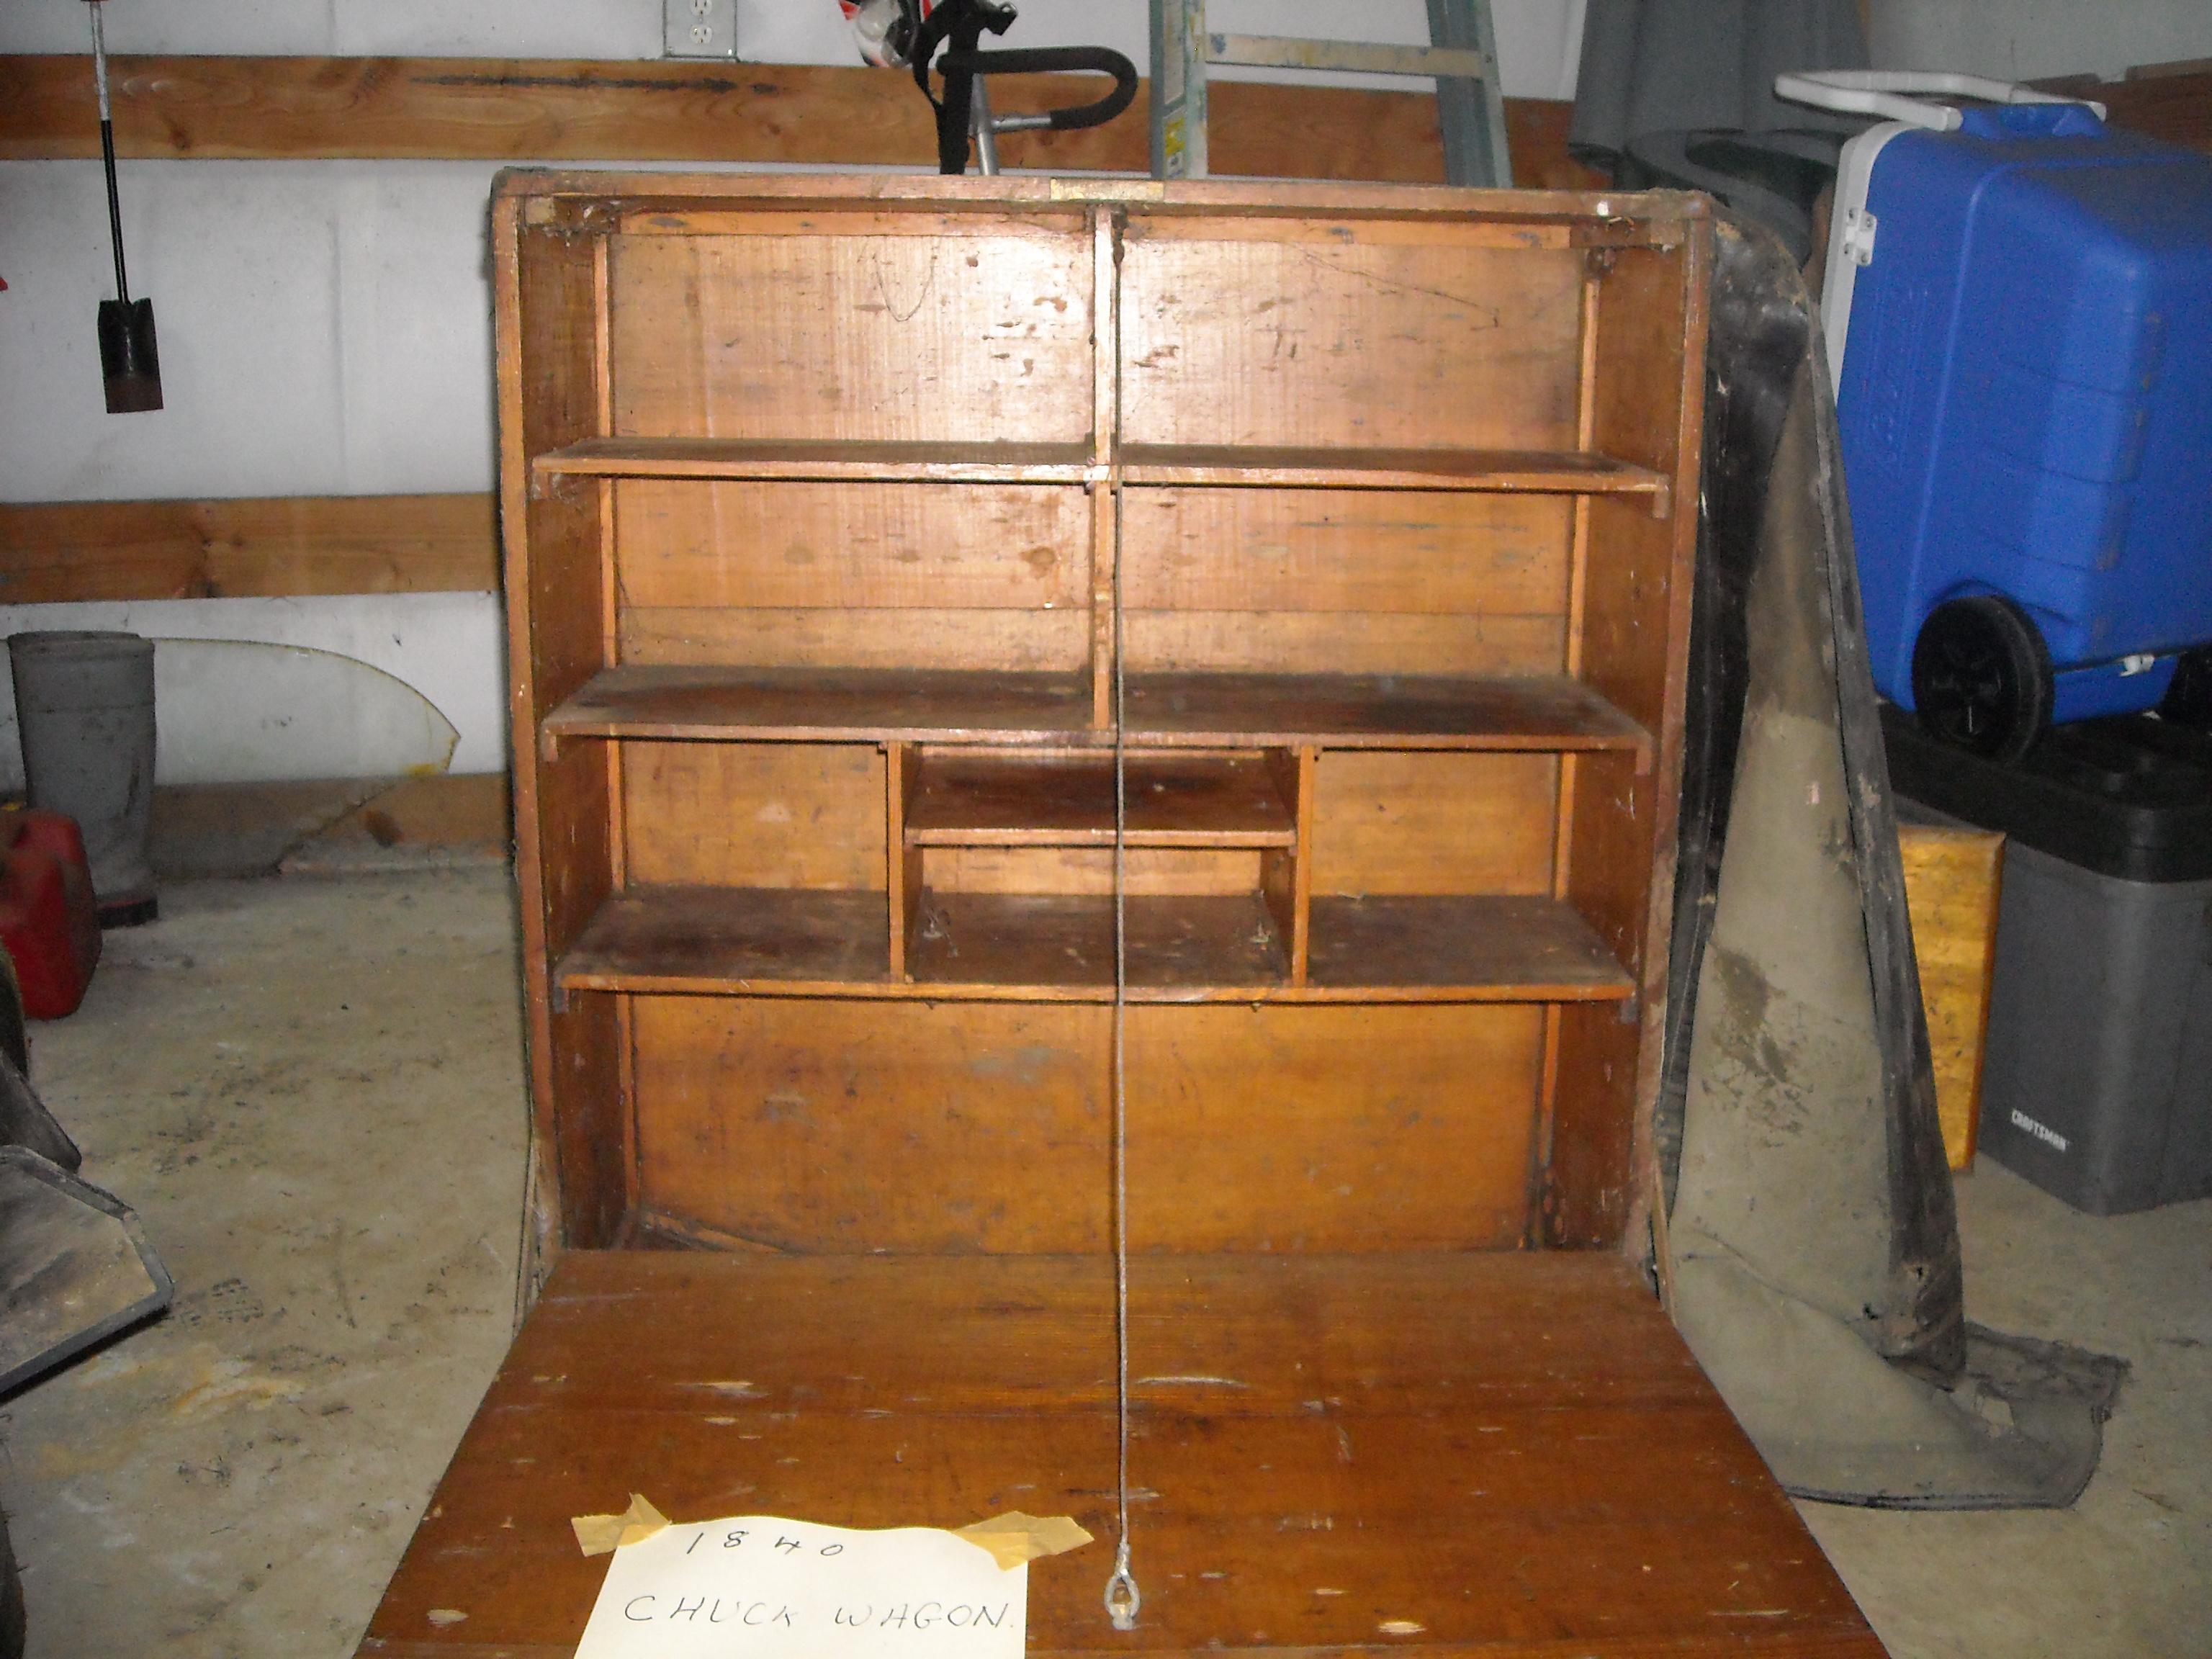 1840 Chuck Wagon Grub Box Antique Appraisal Instappraisal